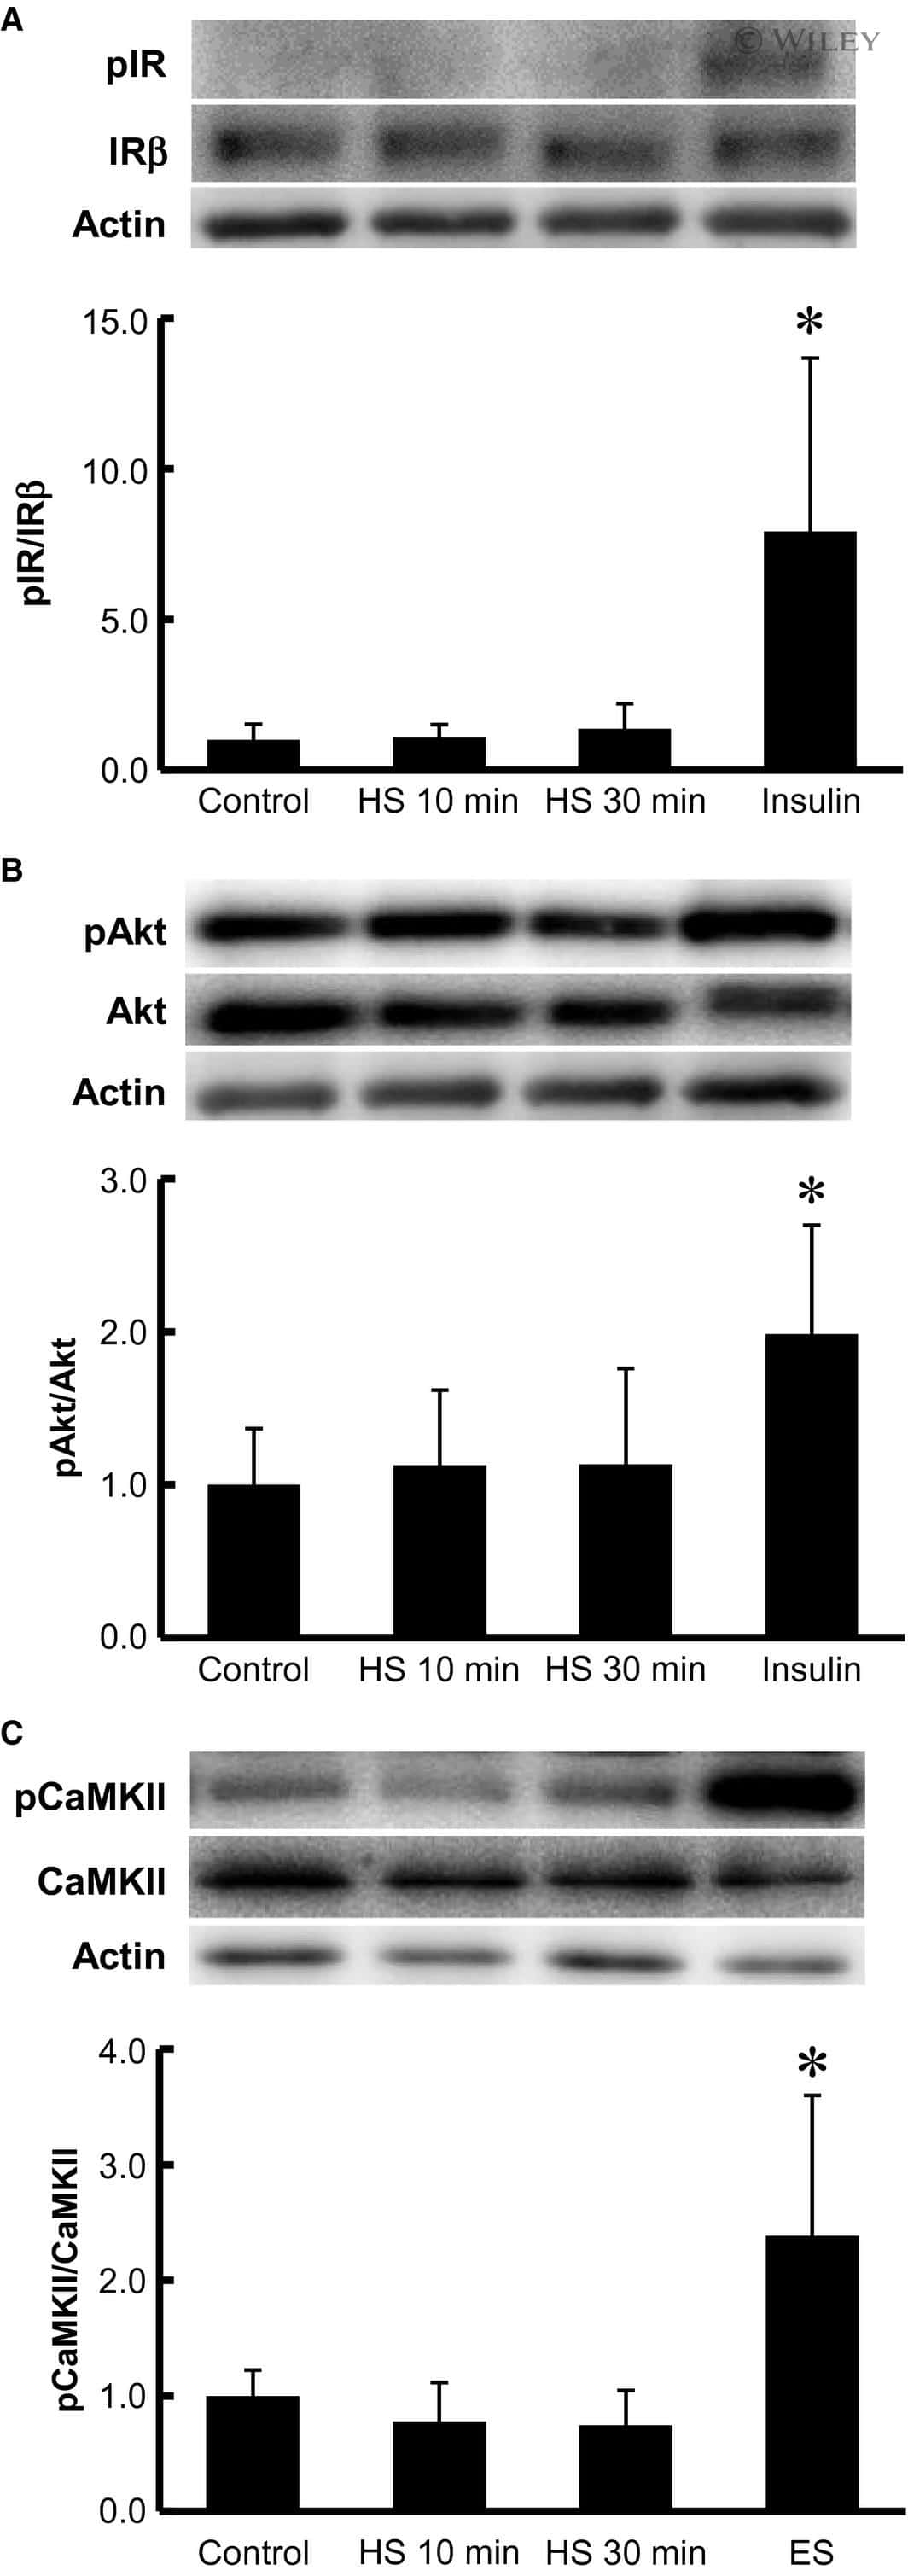 Phospho-IR/IGF1R (Tyr1158, Tyr1162, Tyr1163) Antibody